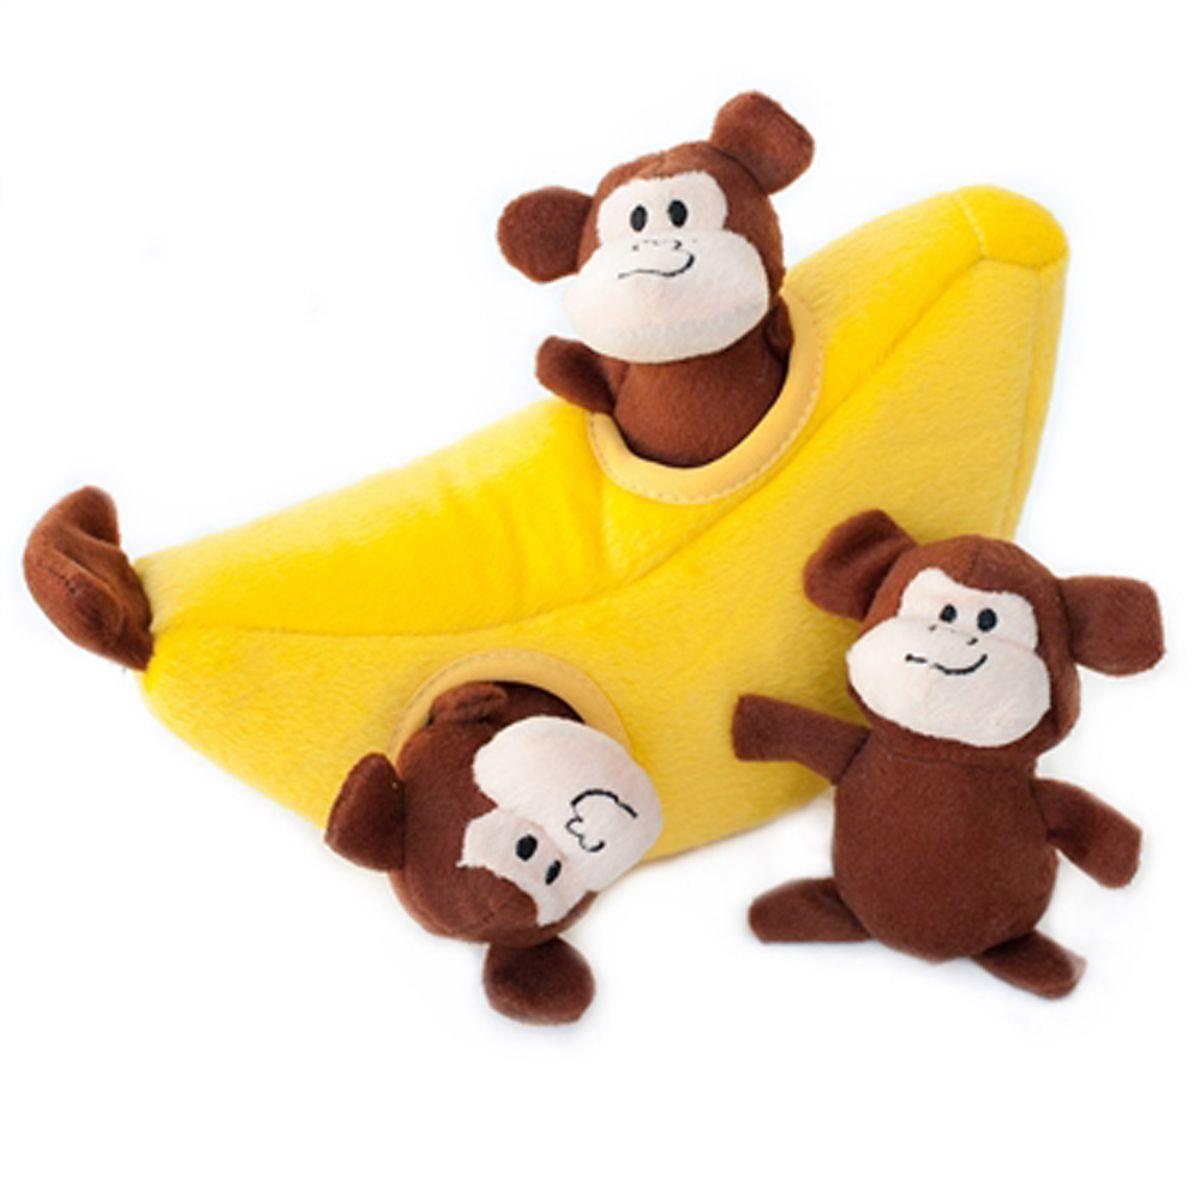 Interactive Dog Toys Exercise ZippyPaws Burrow Dog Toy - Monkey 'n Banana